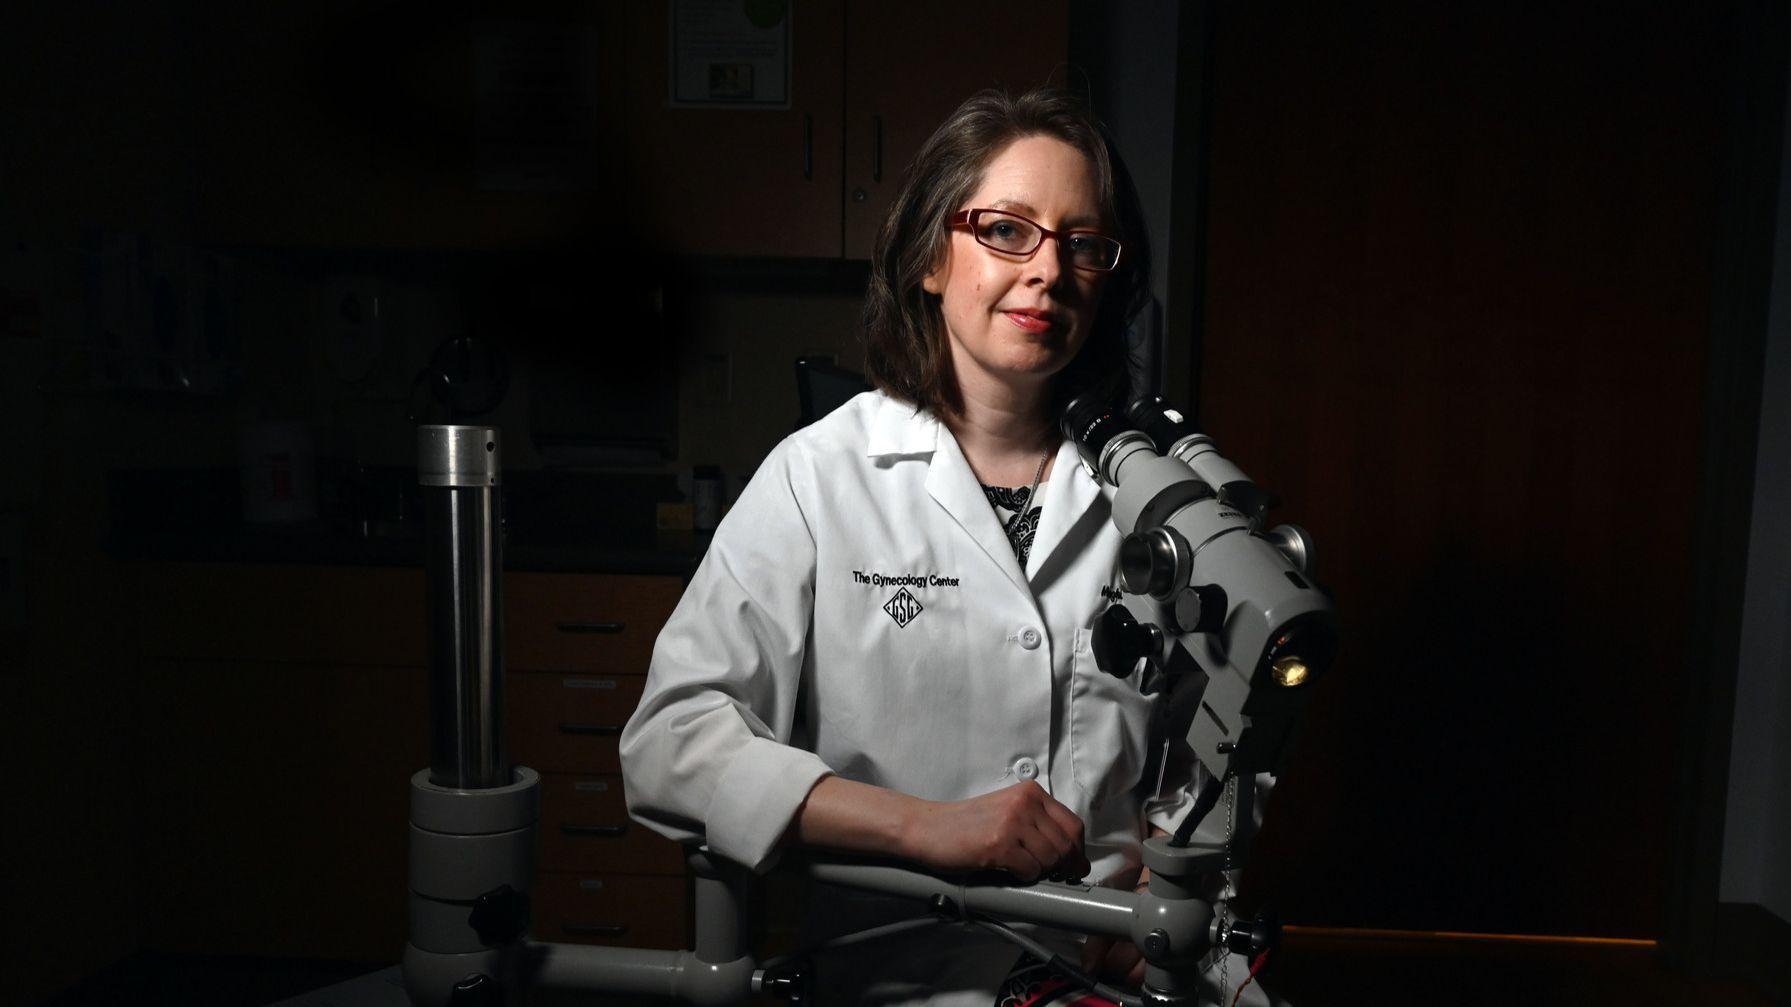 Near sighted gynecologist